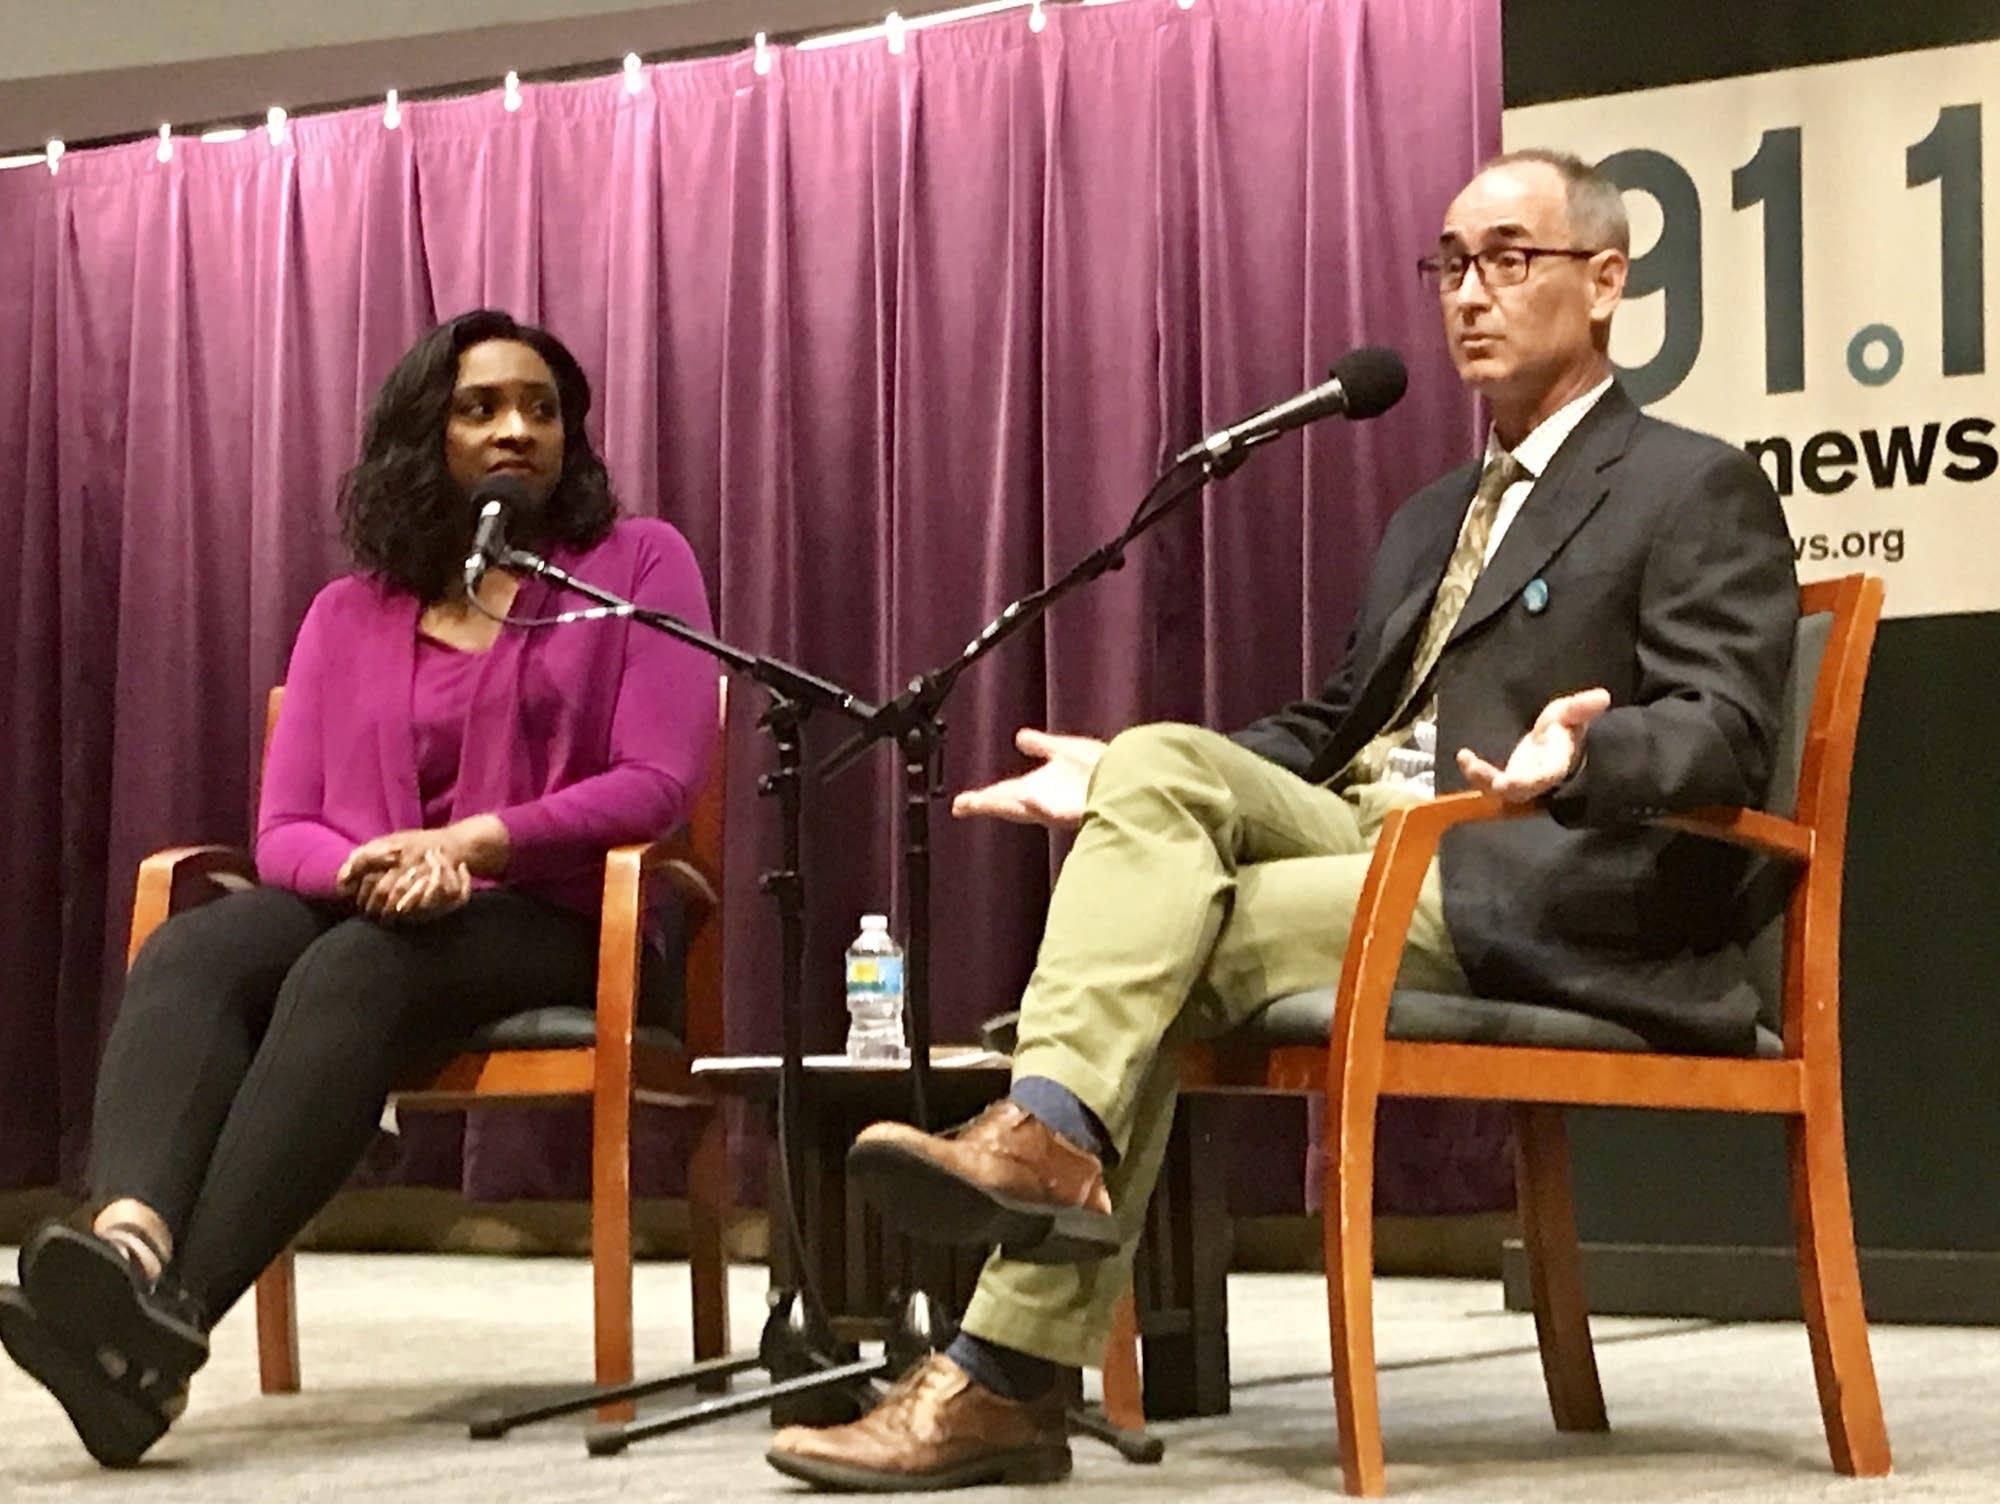 MPR News host Angela Davis interviews NPR's correspondent Jason Beaubien.